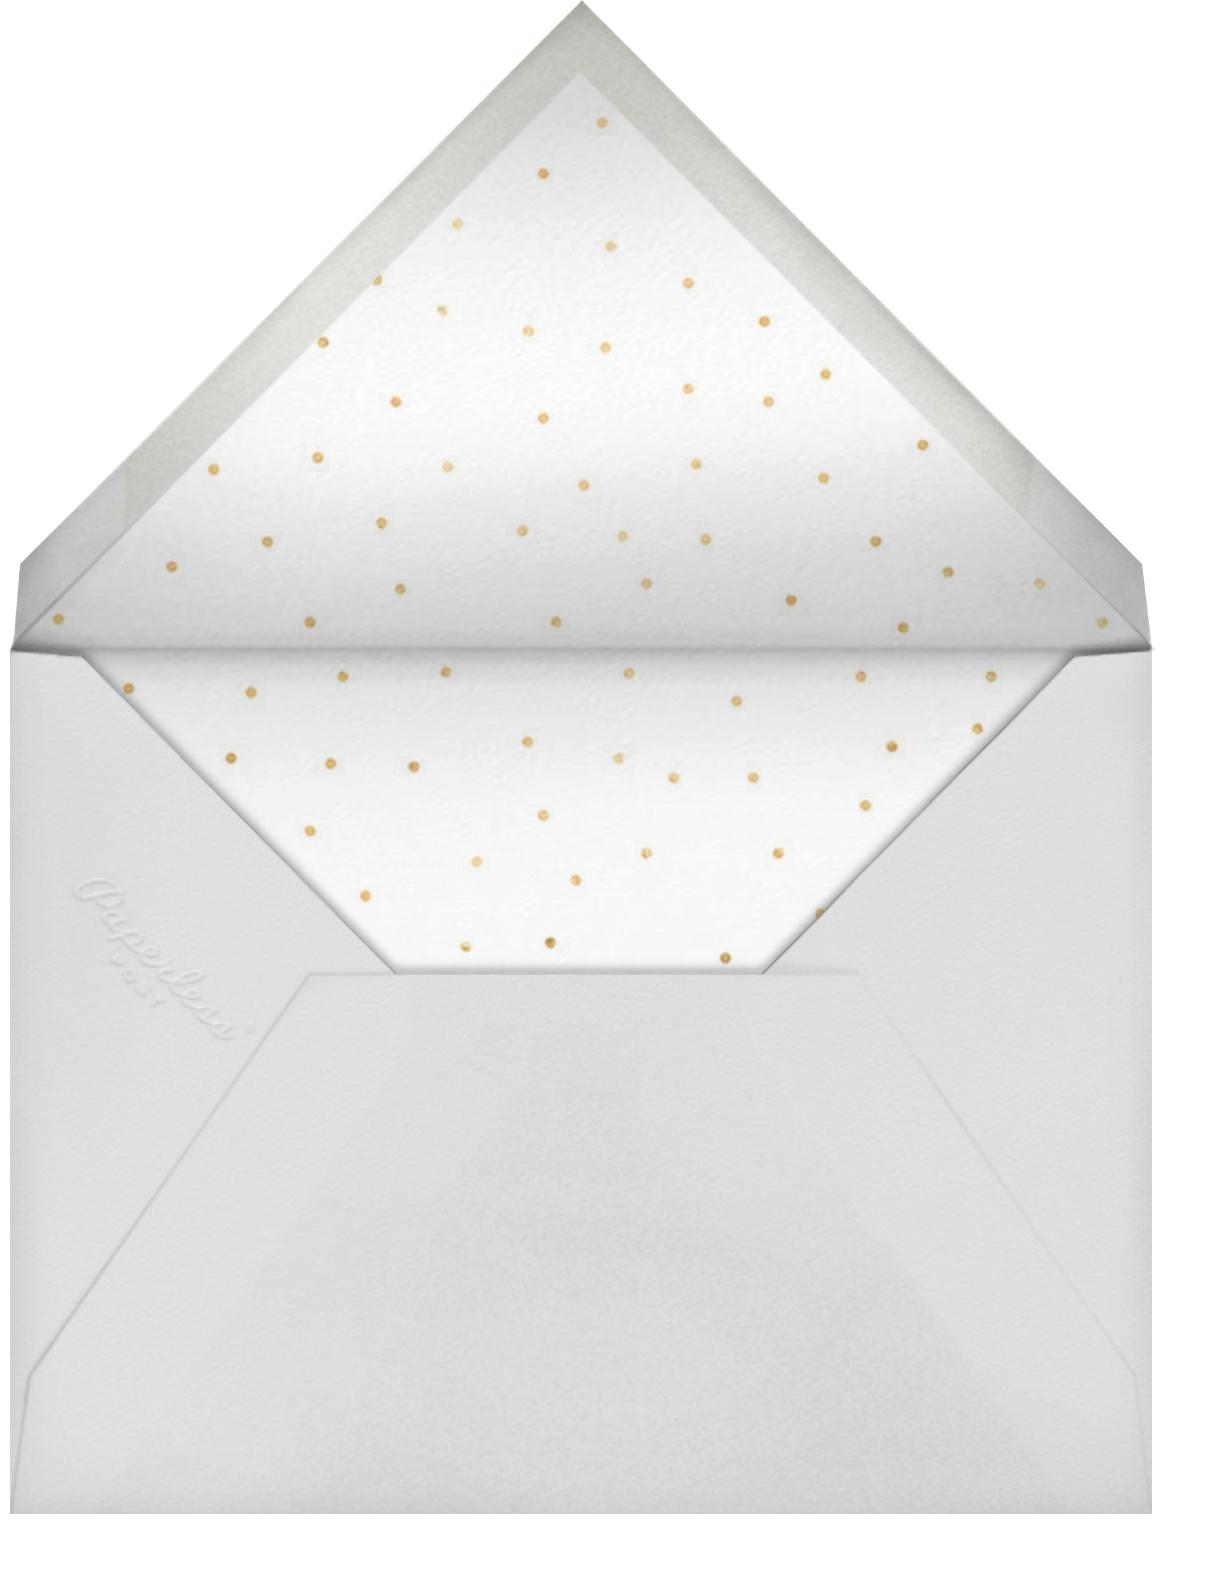 Cursive and Confetti - Sugar Paper - Graduation party - envelope back